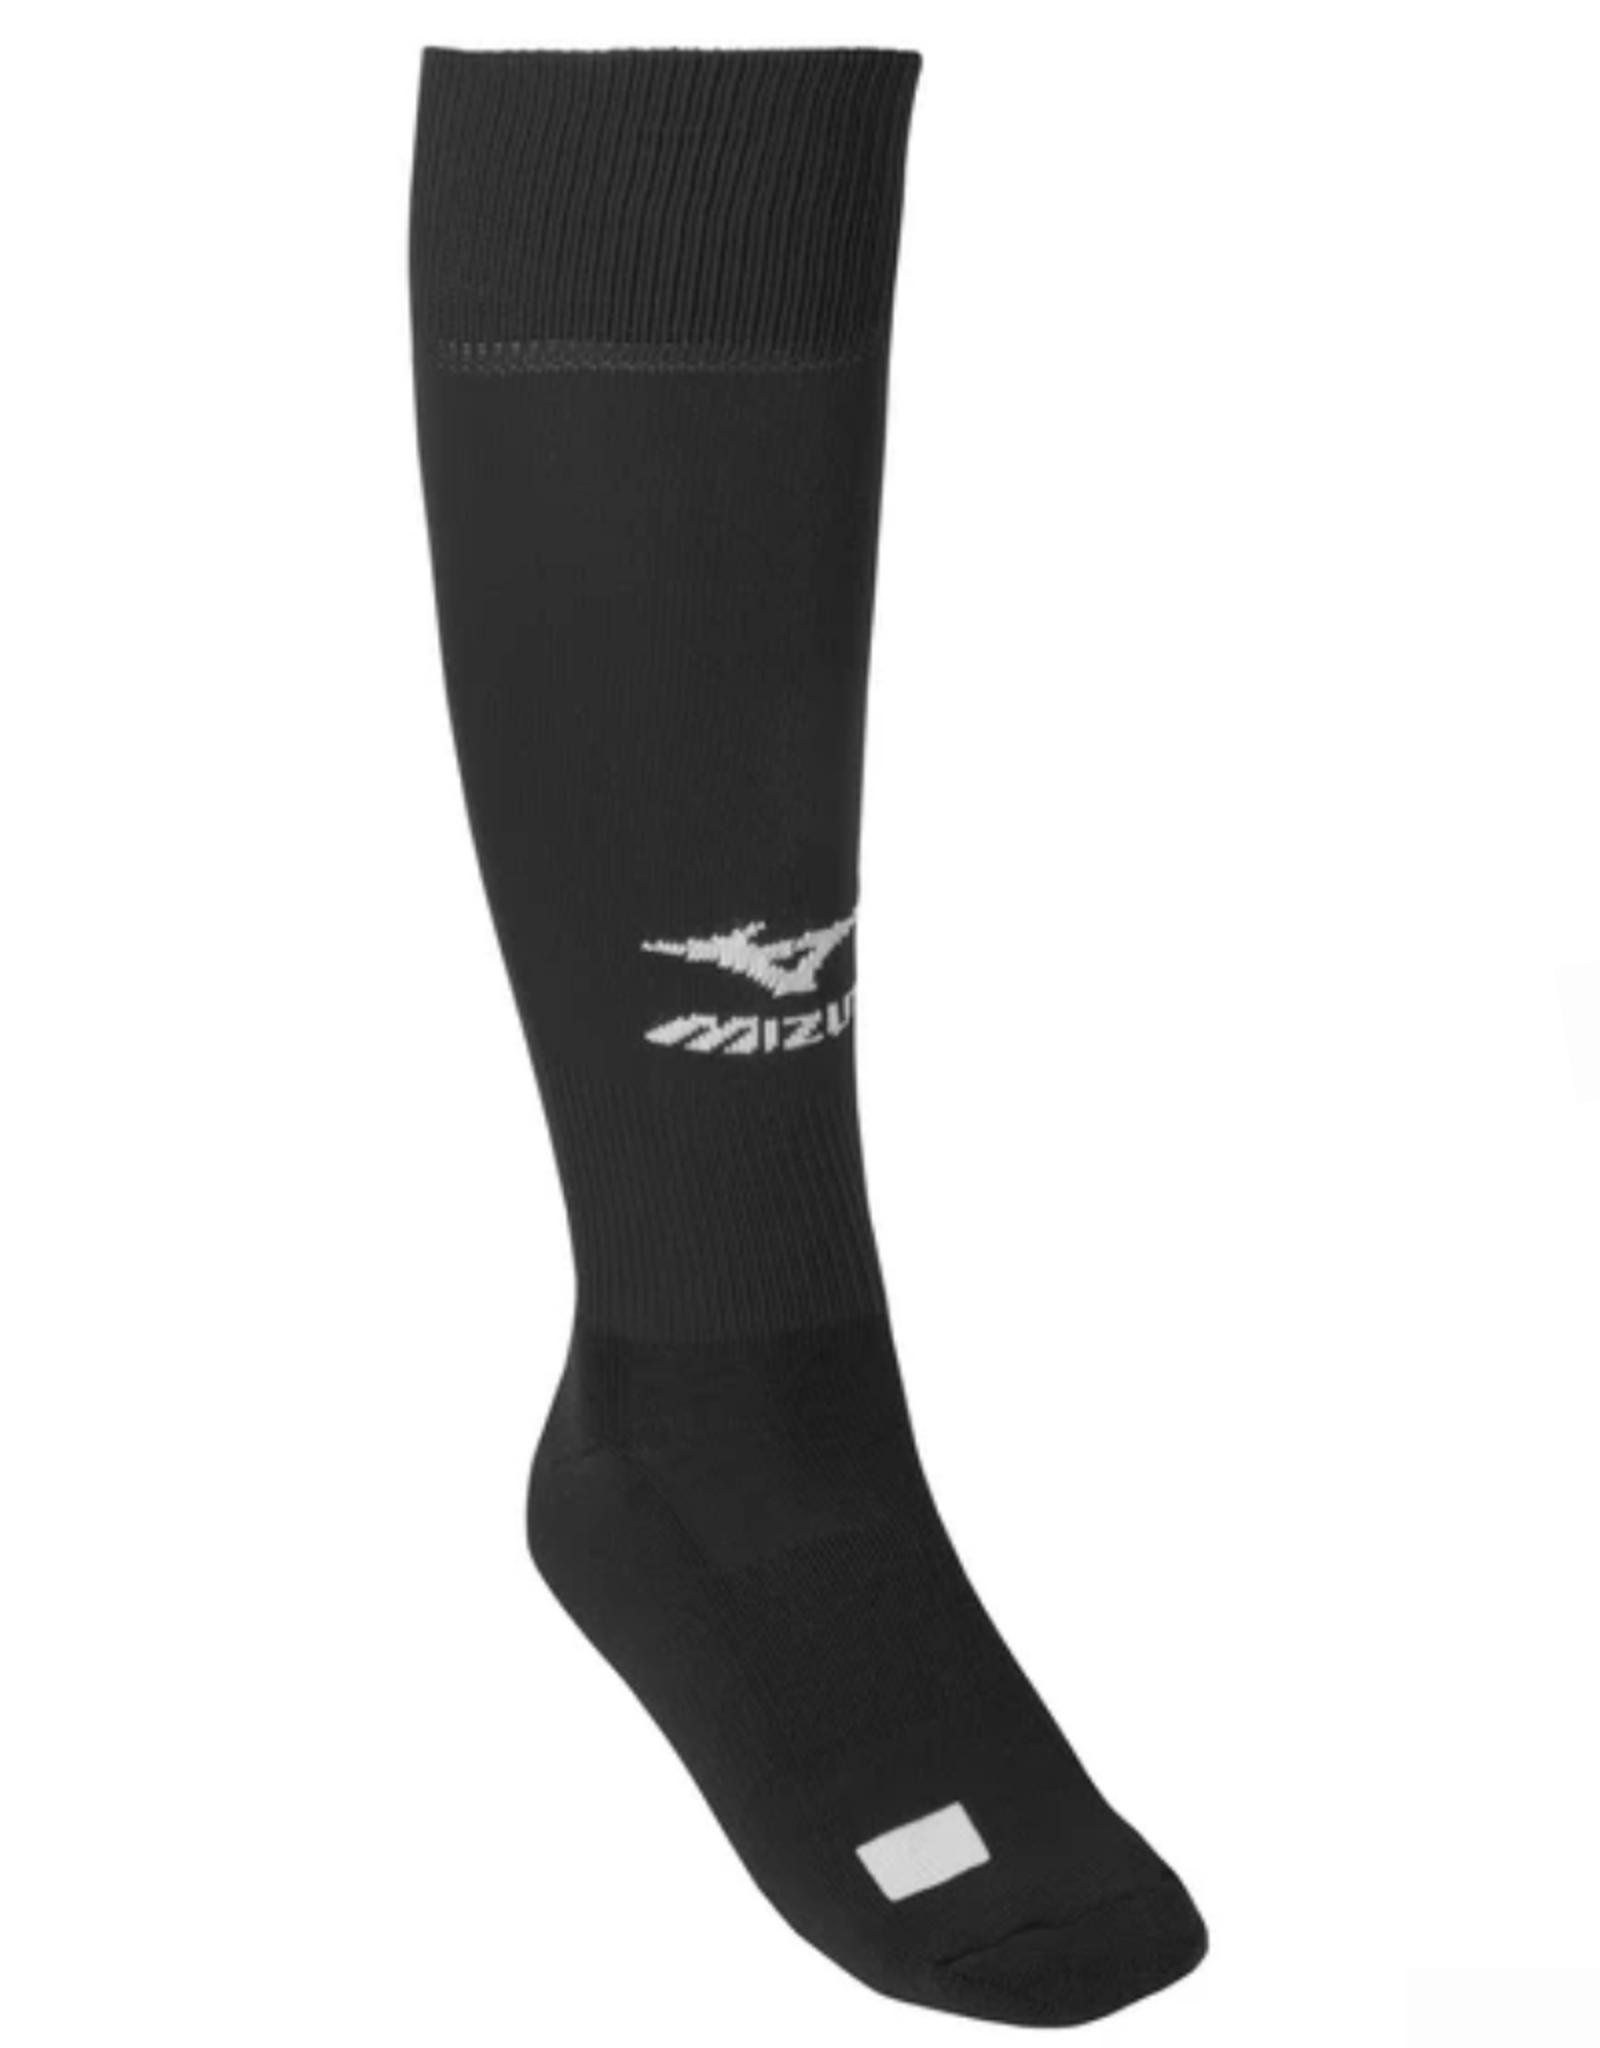 Mizuno Performance Volleyball Sock Black